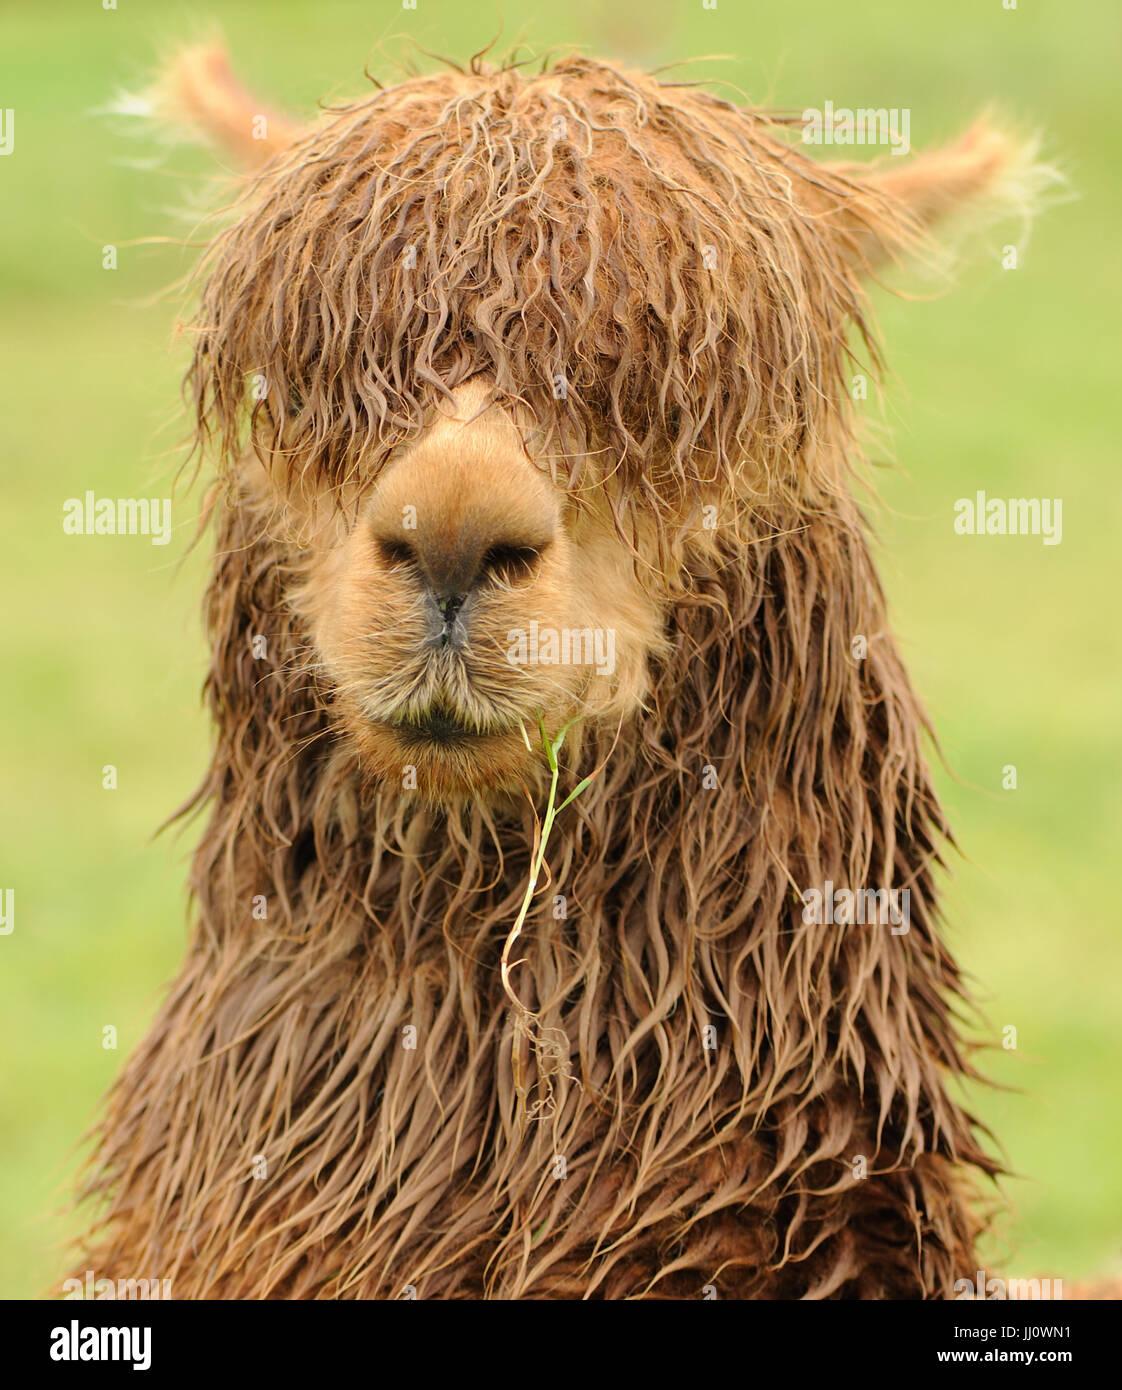 Portrait of a damp brown alpaca. Bedgebury Forest, Kent, UK. - Stock Image